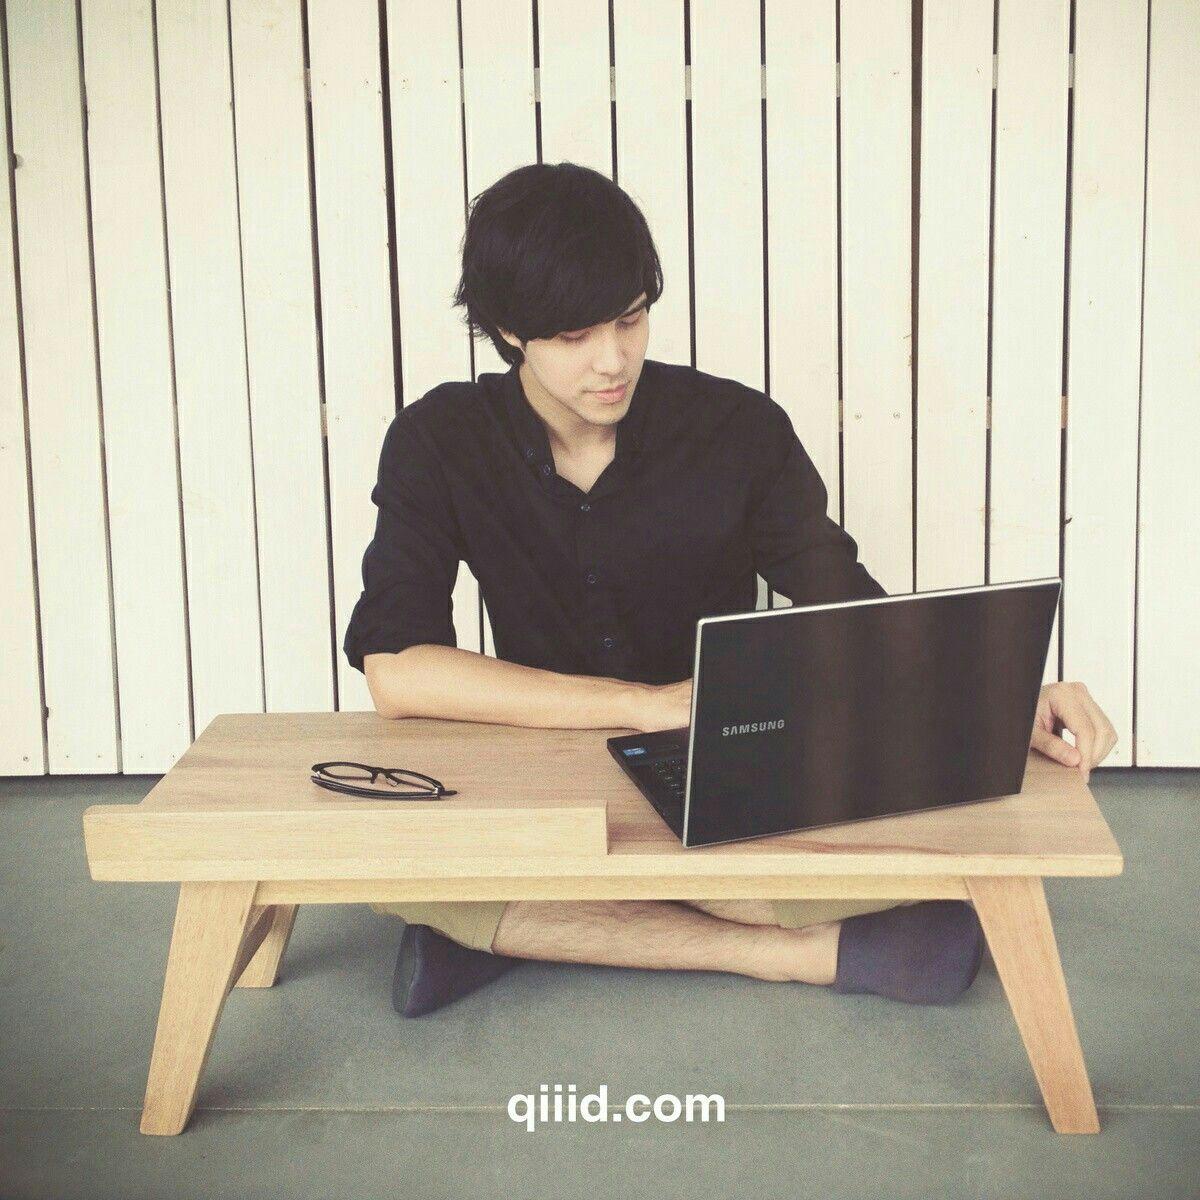 Pin By Akayadi Wijaya On Stand Chairs In 2020 Floor Desk Study Table Designs Floor Sitting